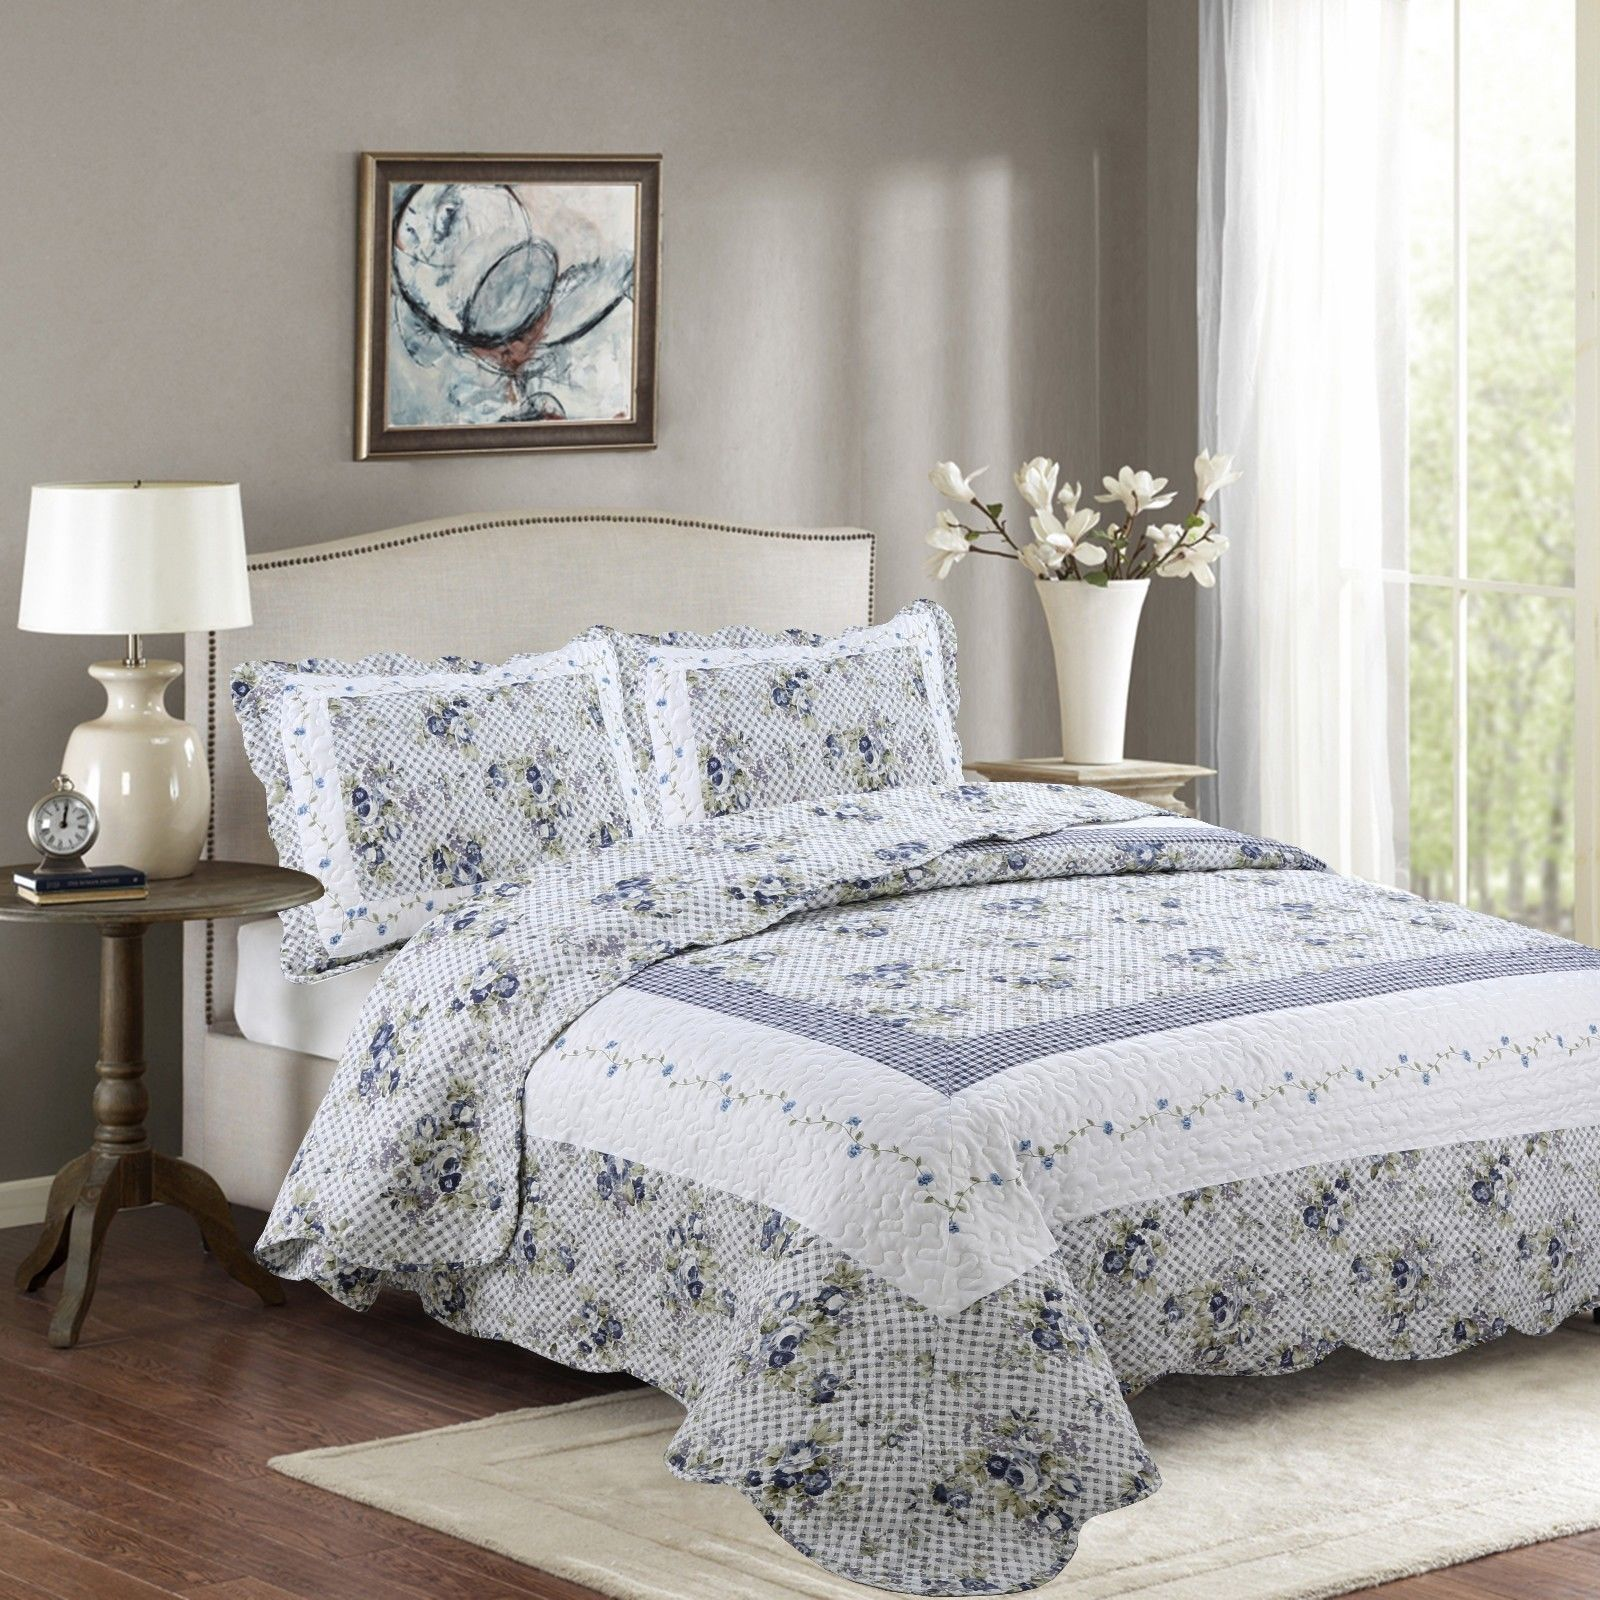 Fancy Linen 2pc Twin Reversible Bedspread Floral White Blue Green New # Nina